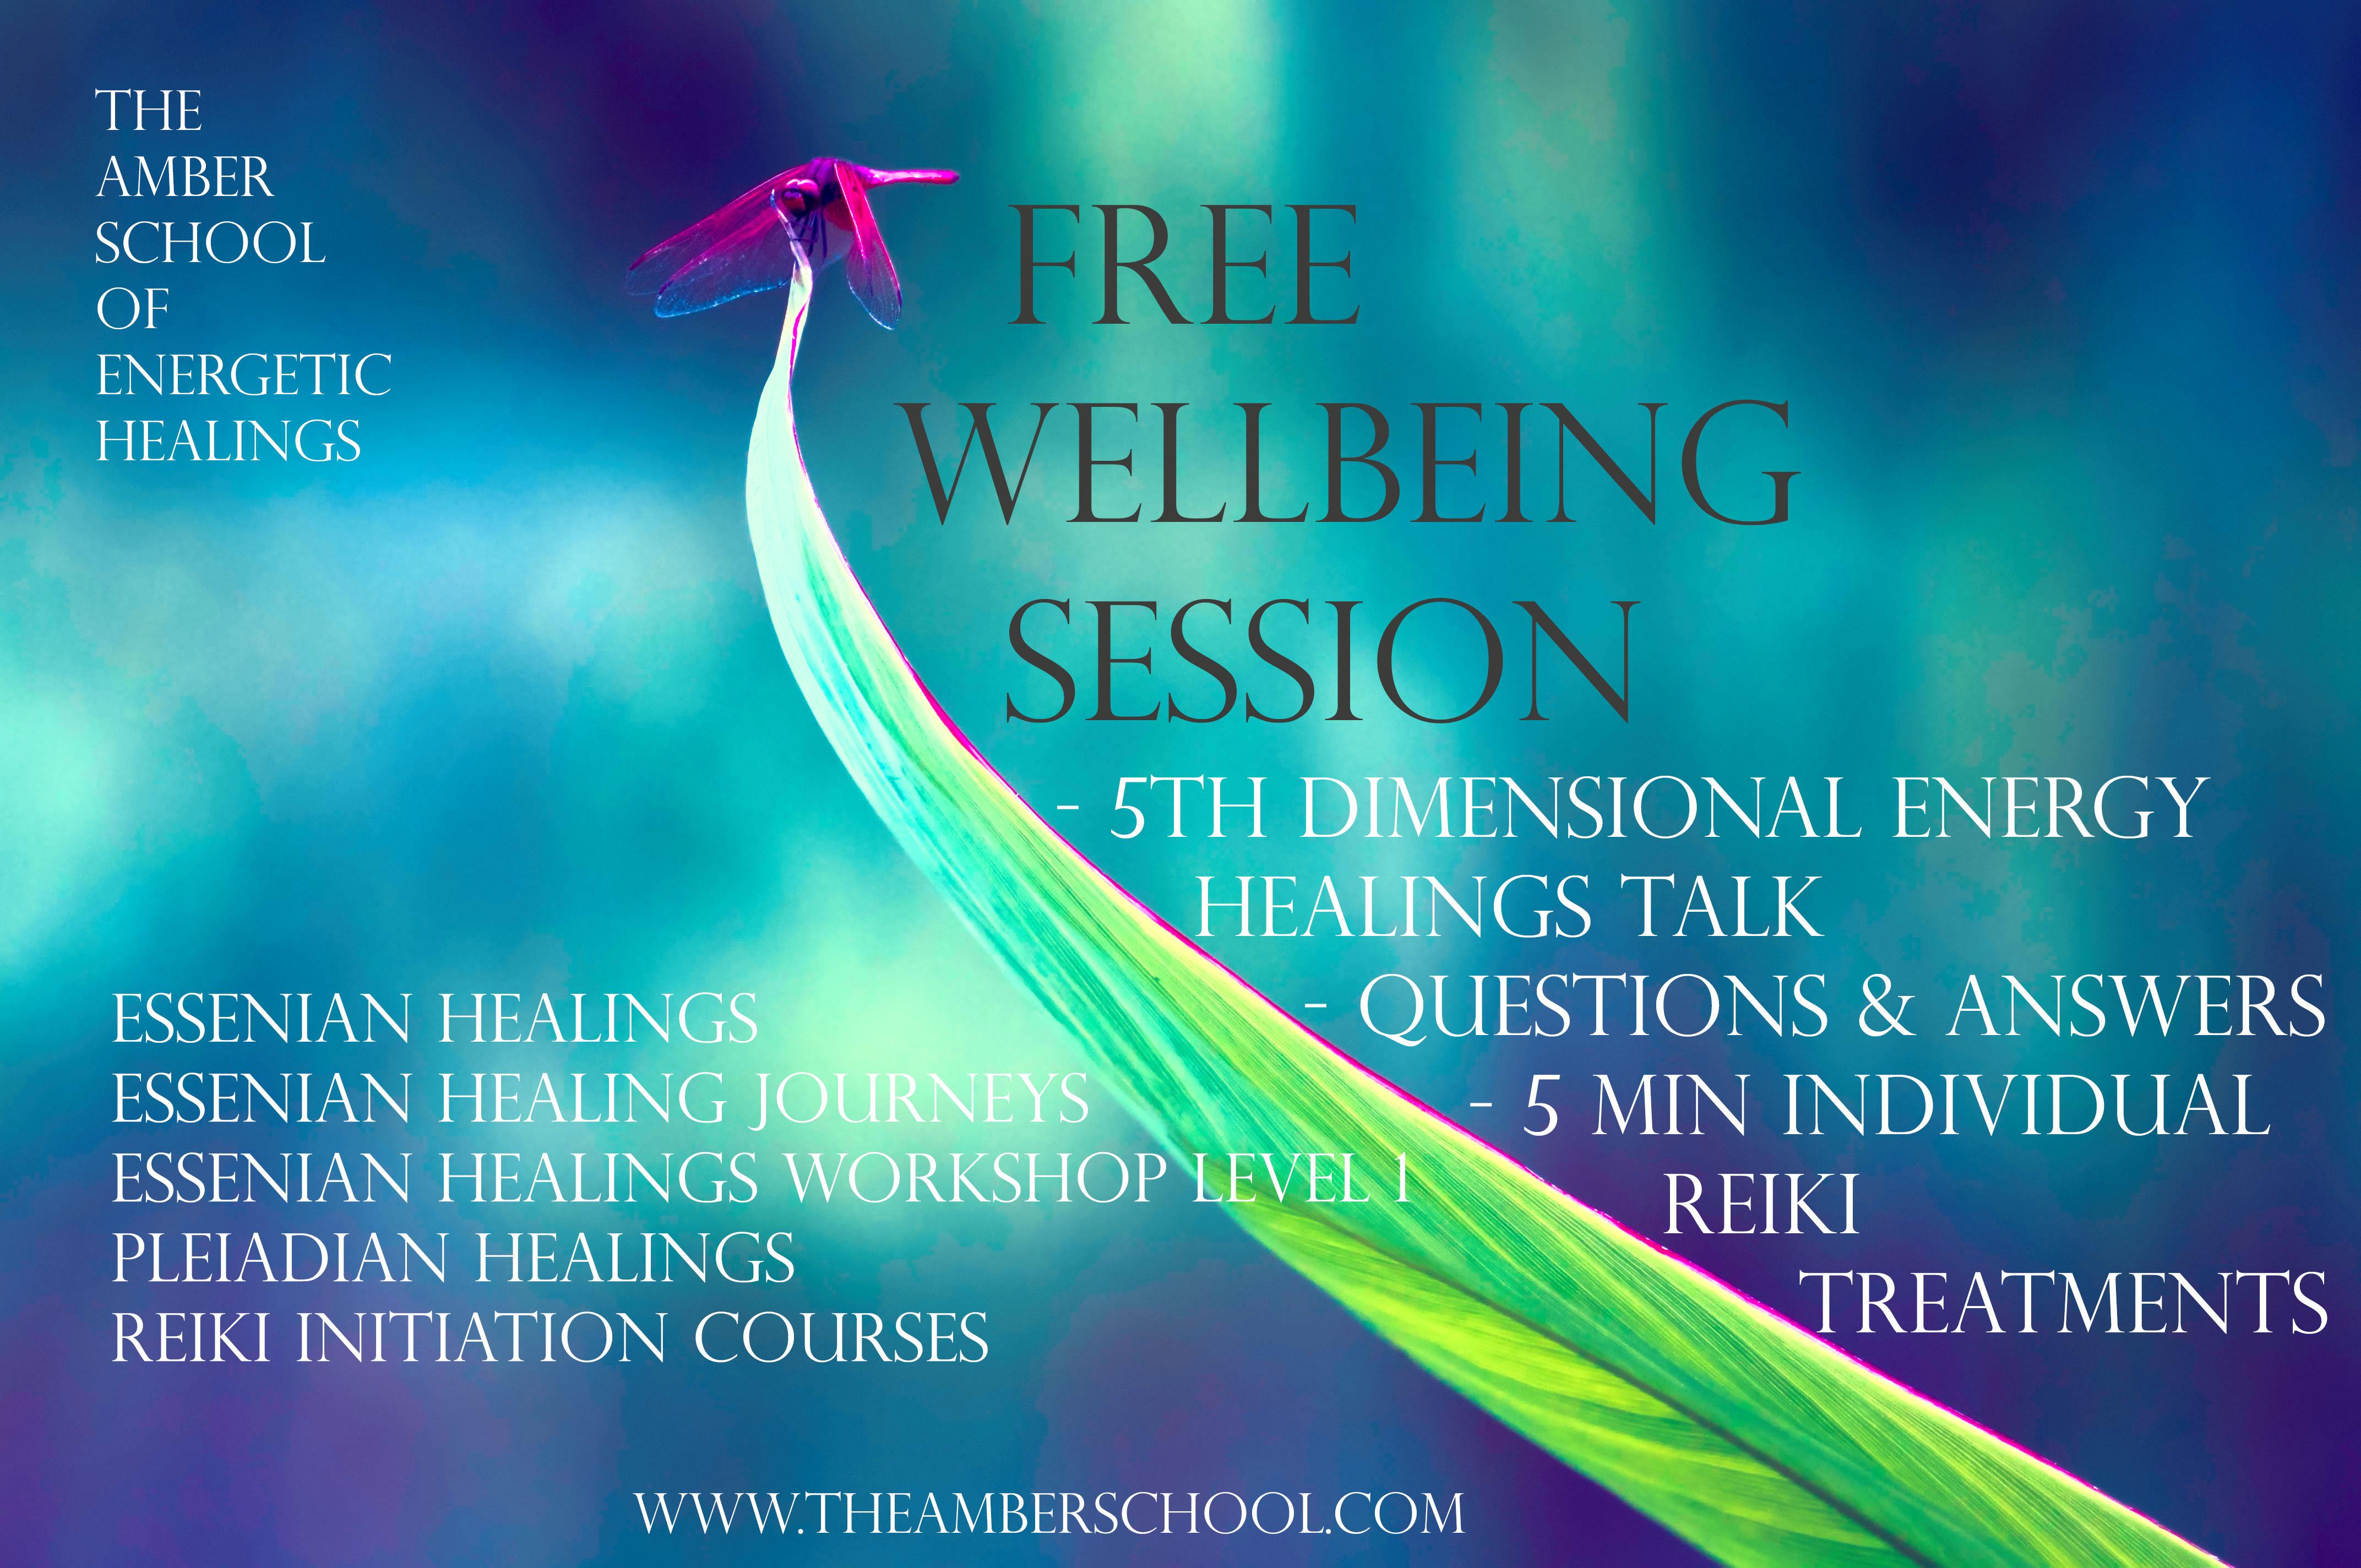 Energy Healing Treatments and Courses - Essenian Healings